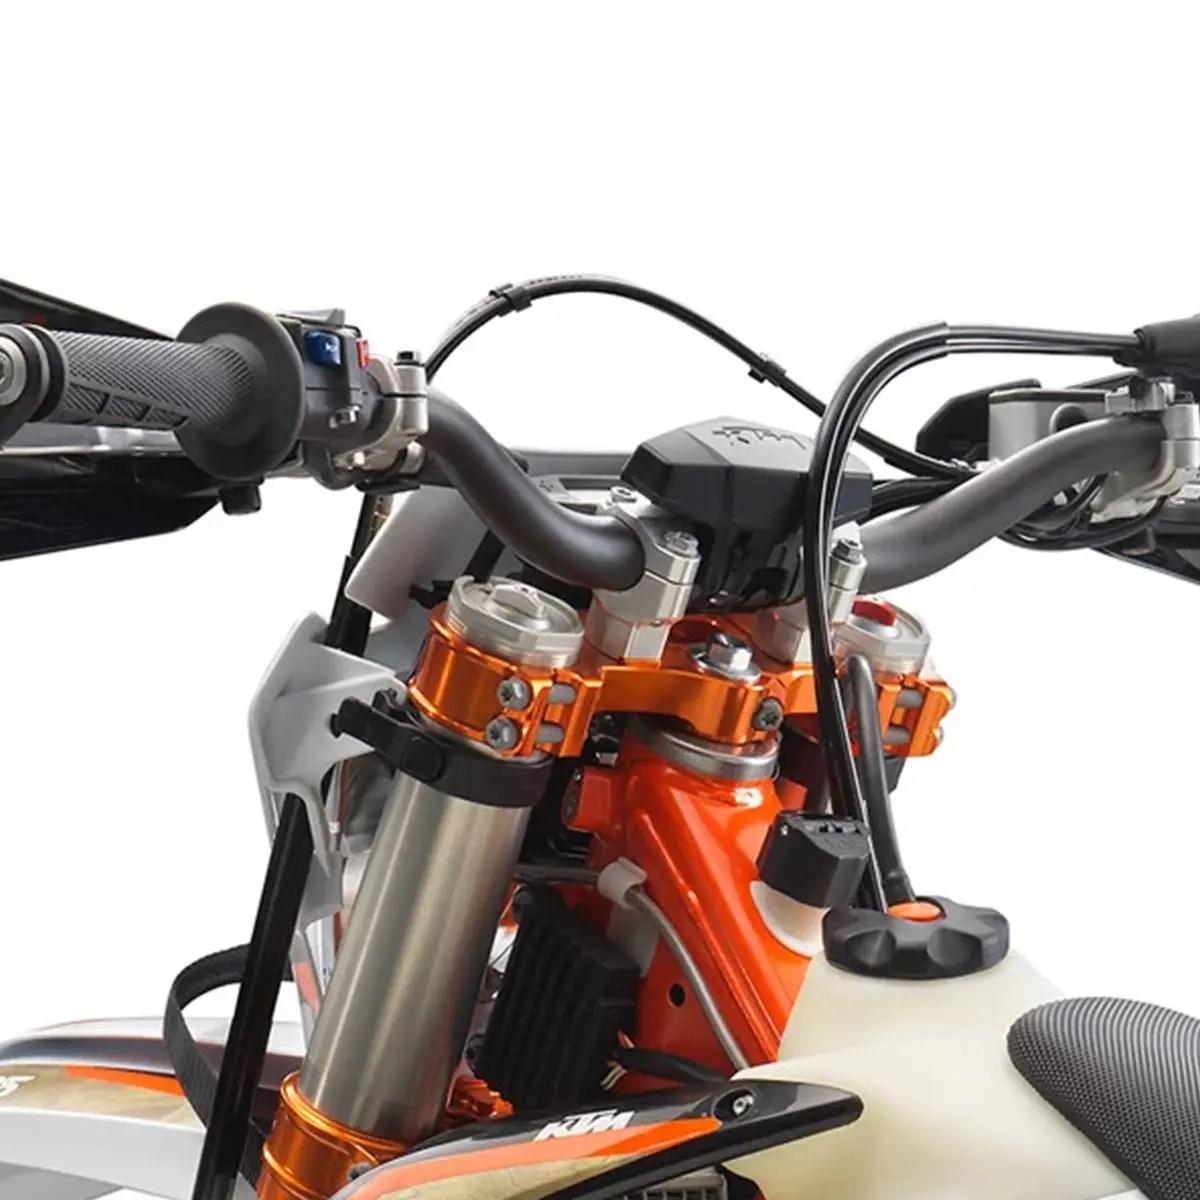 GUIDON-KTM-300-EXC-TPI-ERZBERGRODEO-2020